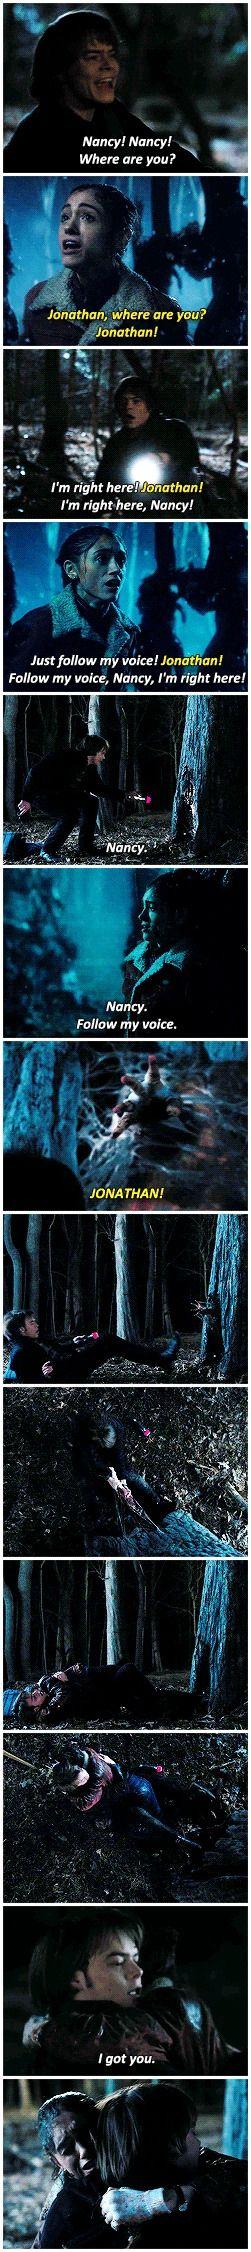 I got you. #stranger things  #nancy x jonathan #1.05